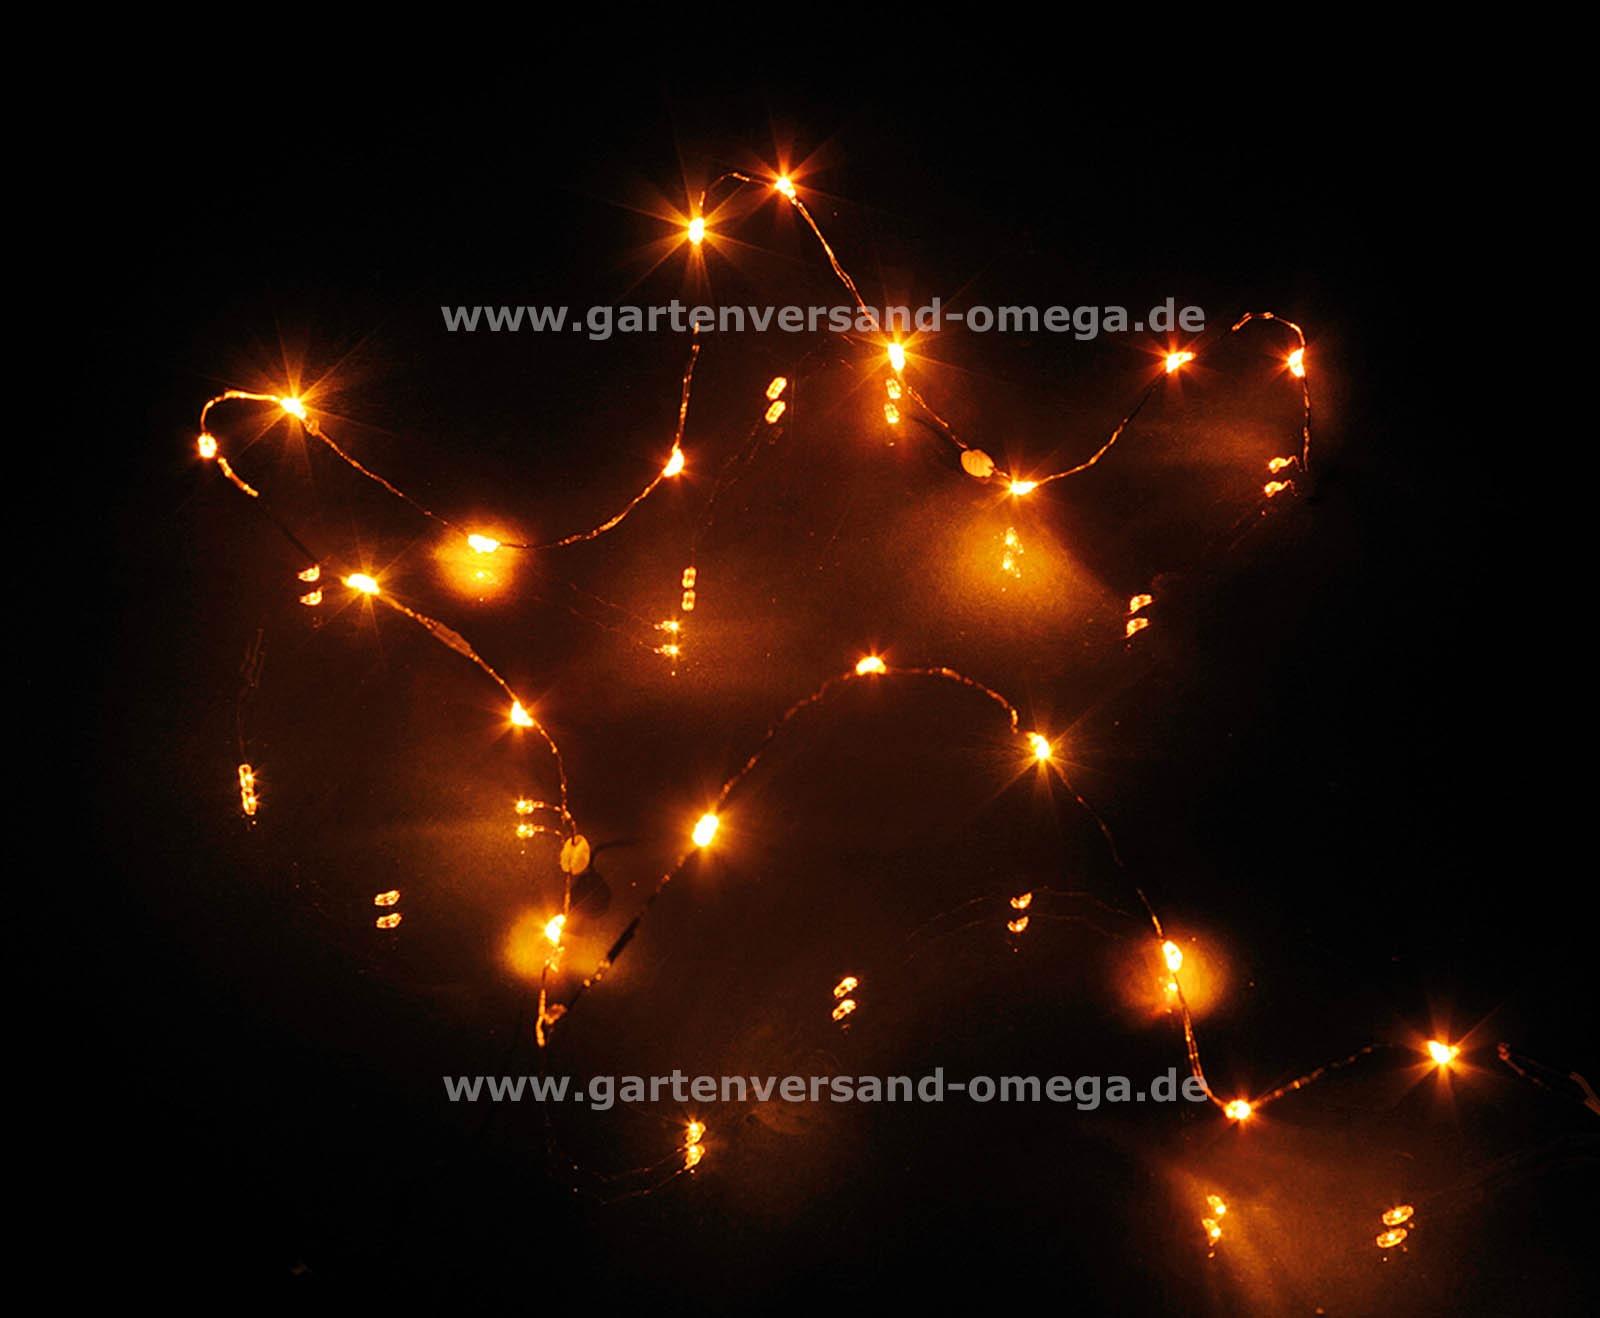 batteriebetriebene led lichterkette mit drahtkabel farbige lichterkette bunte lichterkette. Black Bedroom Furniture Sets. Home Design Ideas